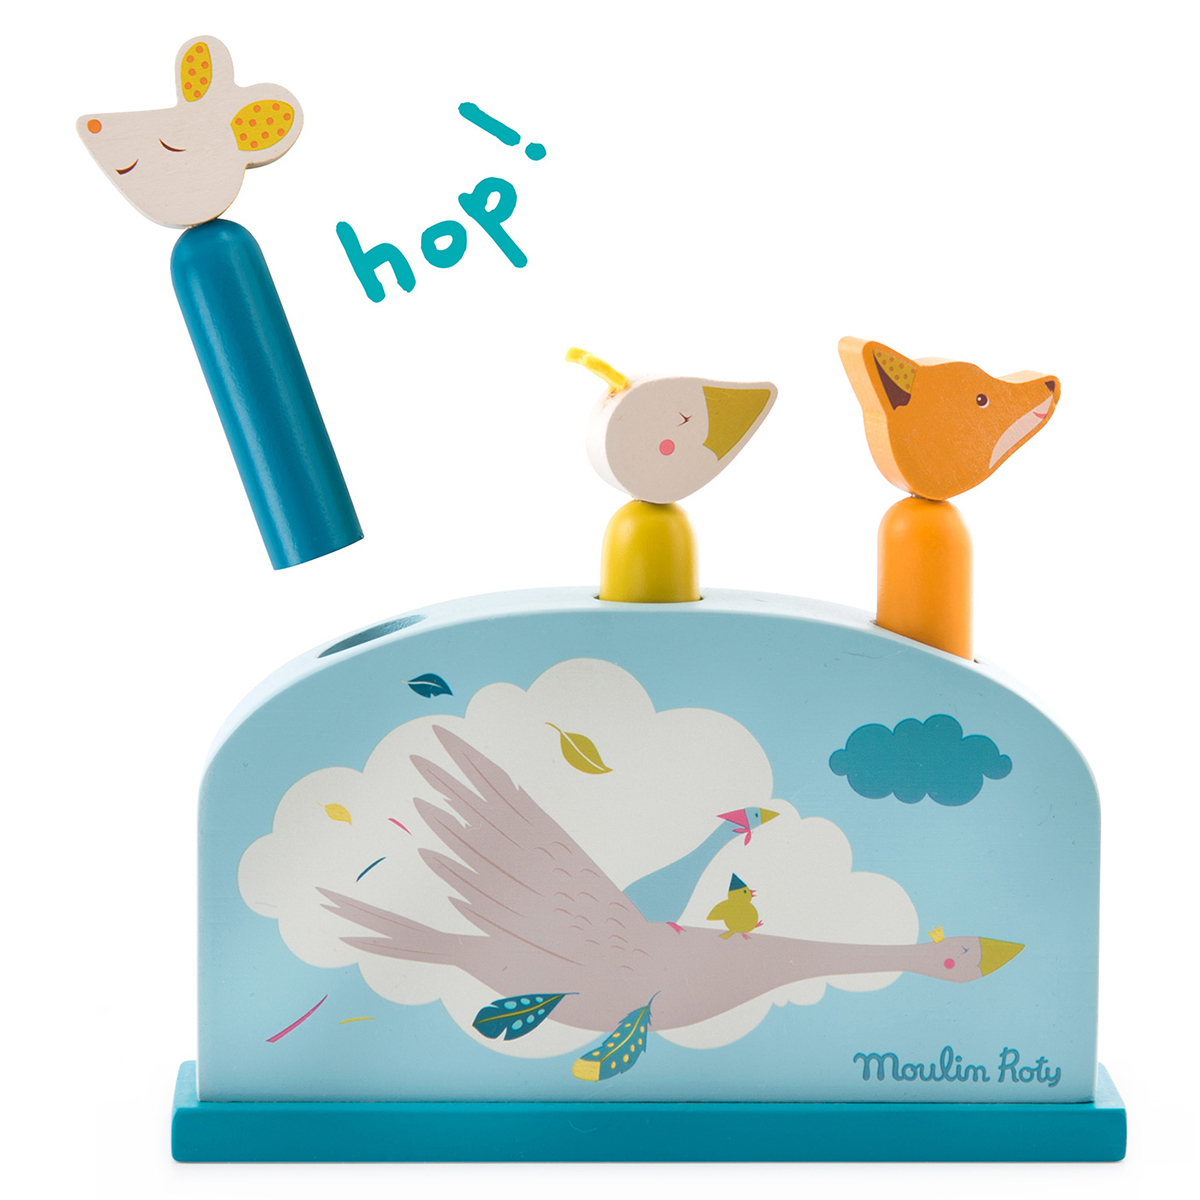 Mes premiers jouets Pop-up - Le Voyage d'Olga Pop-up - Le Voyage d'Olga